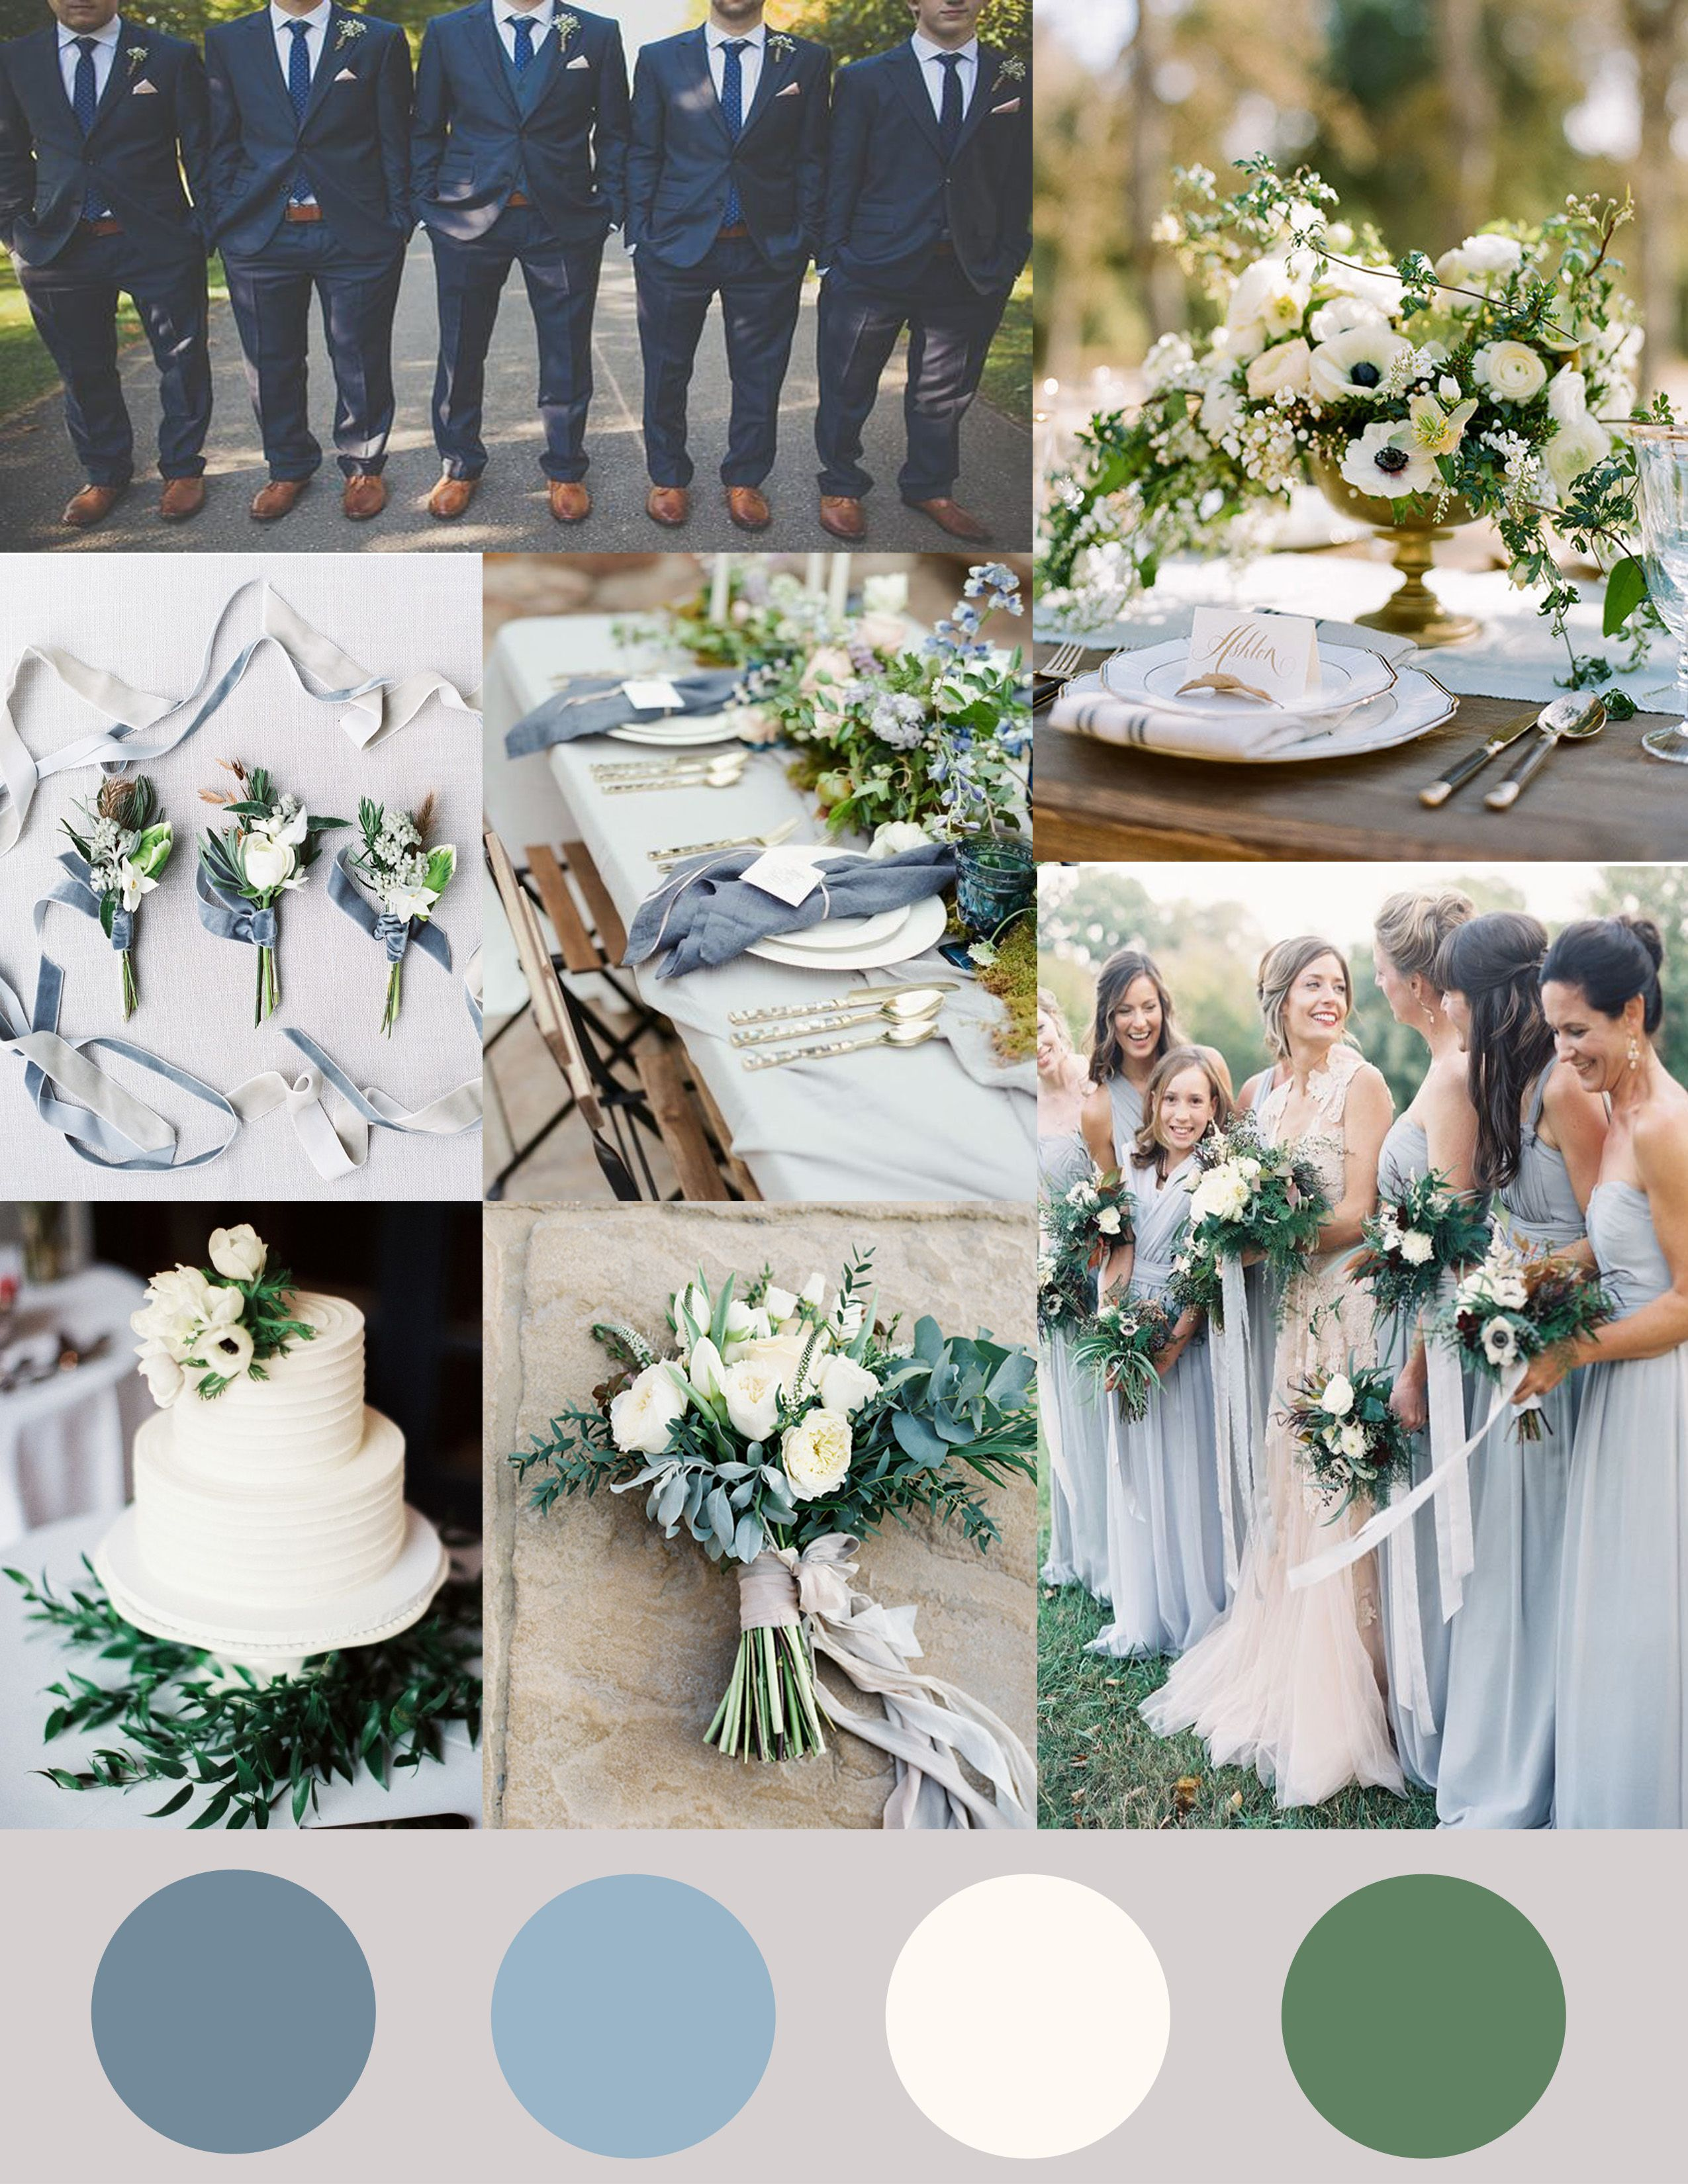 Shades of Dusty Blue, Ivory and Greenery Wedding